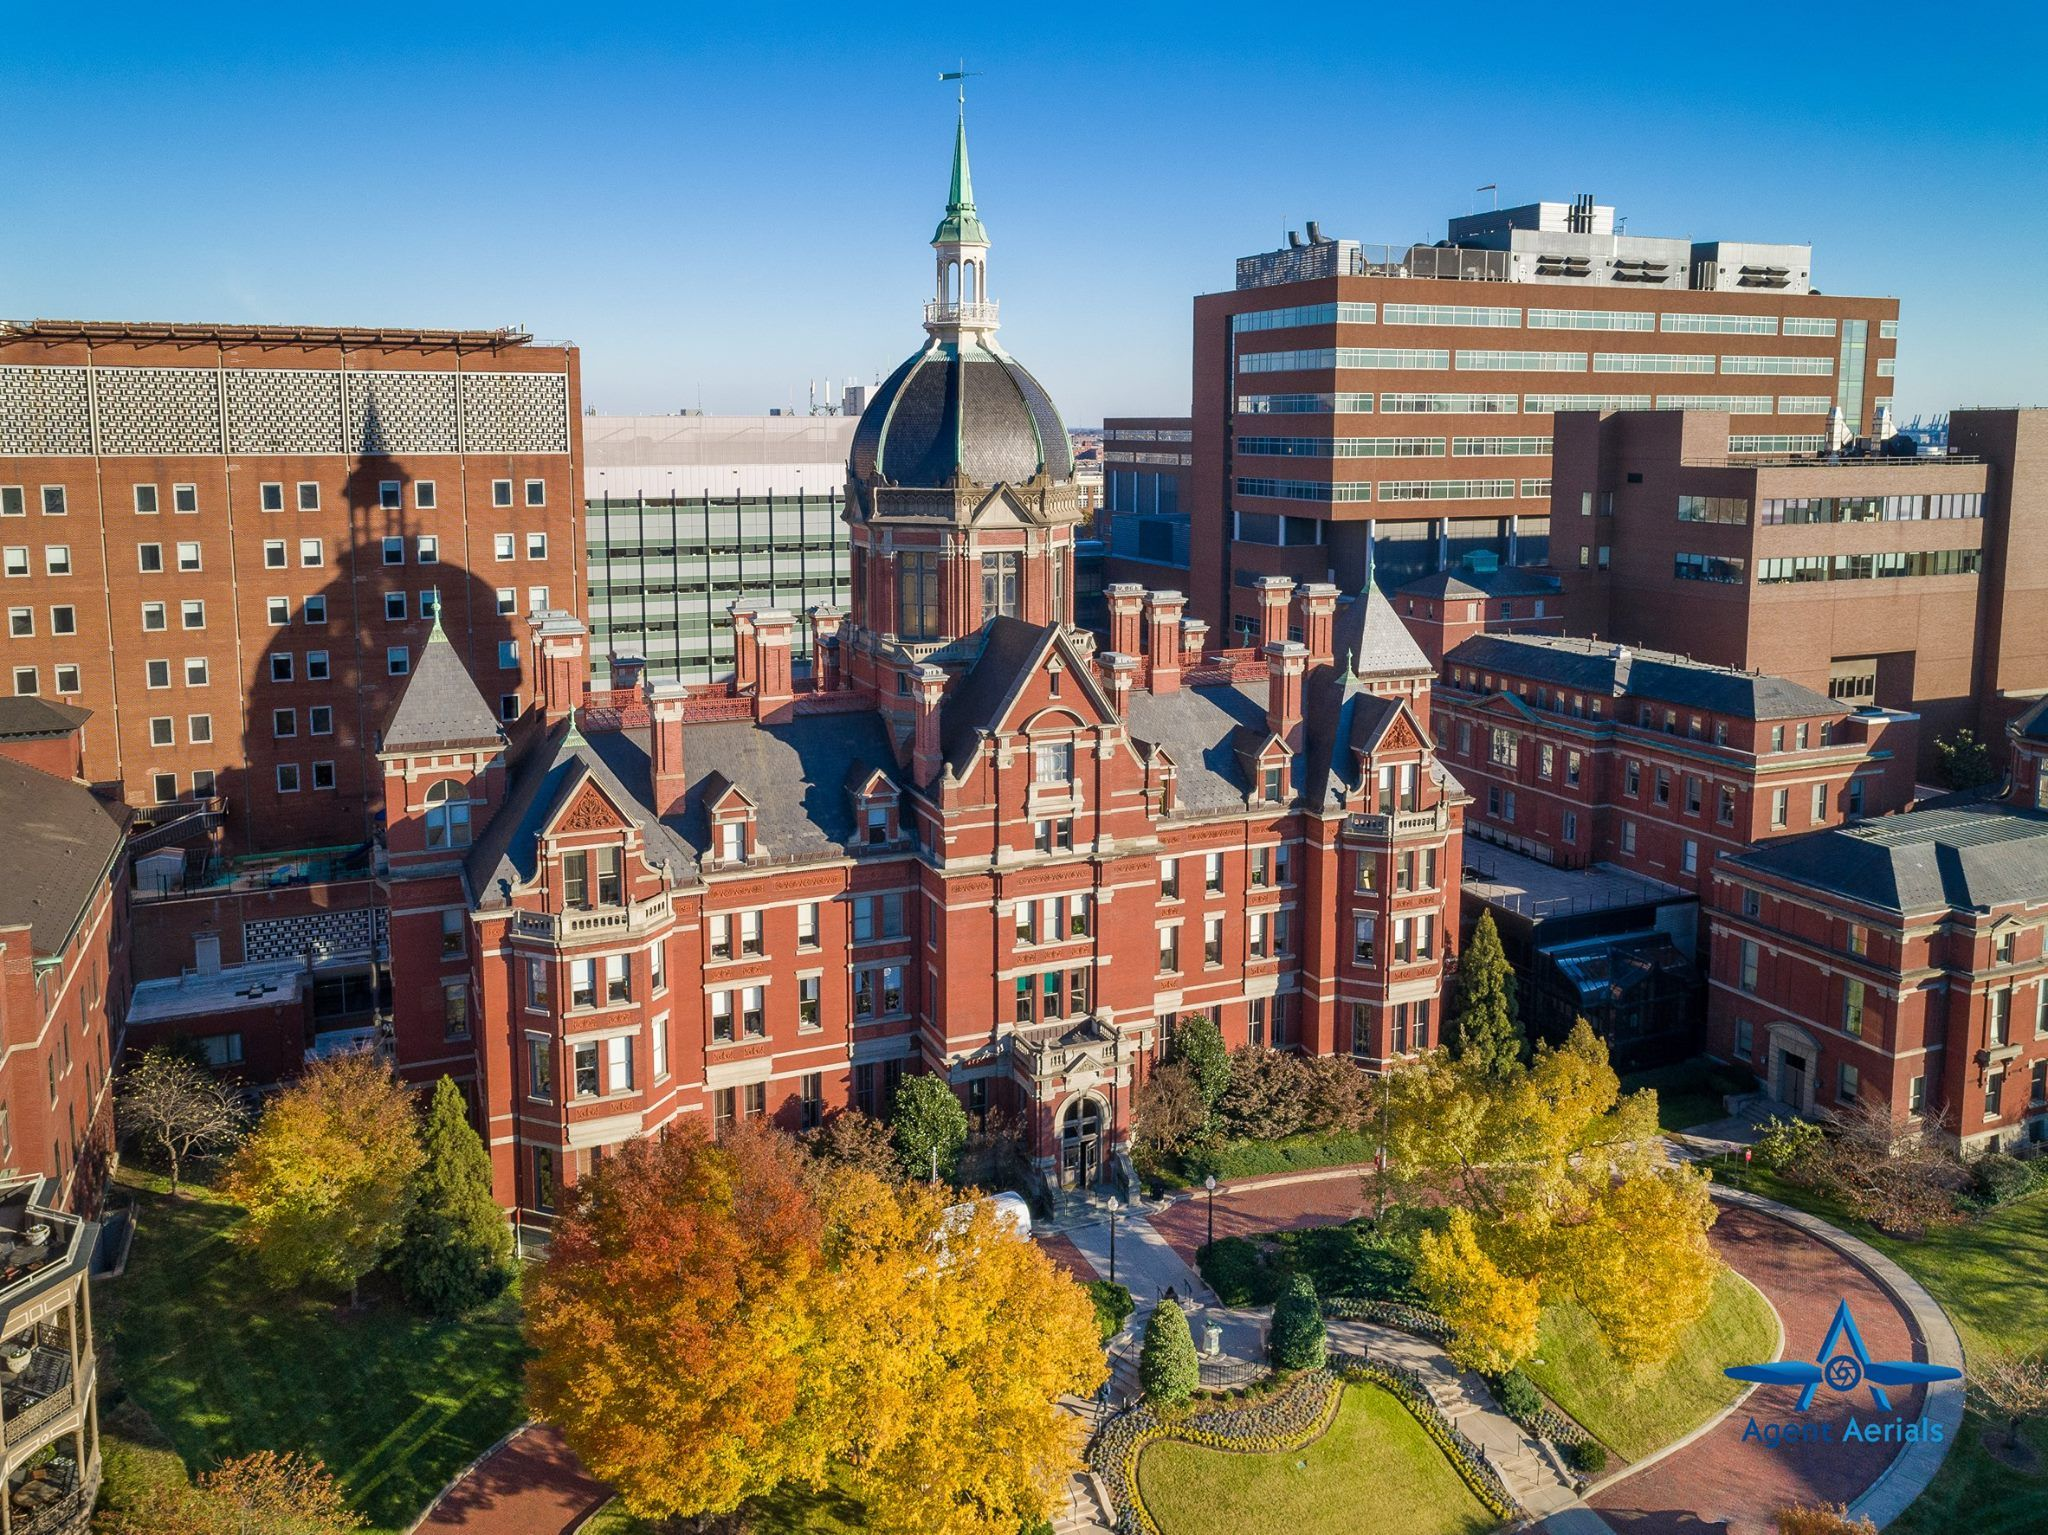 defb88c1a65fb55639efef90e65555c0 - How To Get A Job At Johns Hopkins Hospital